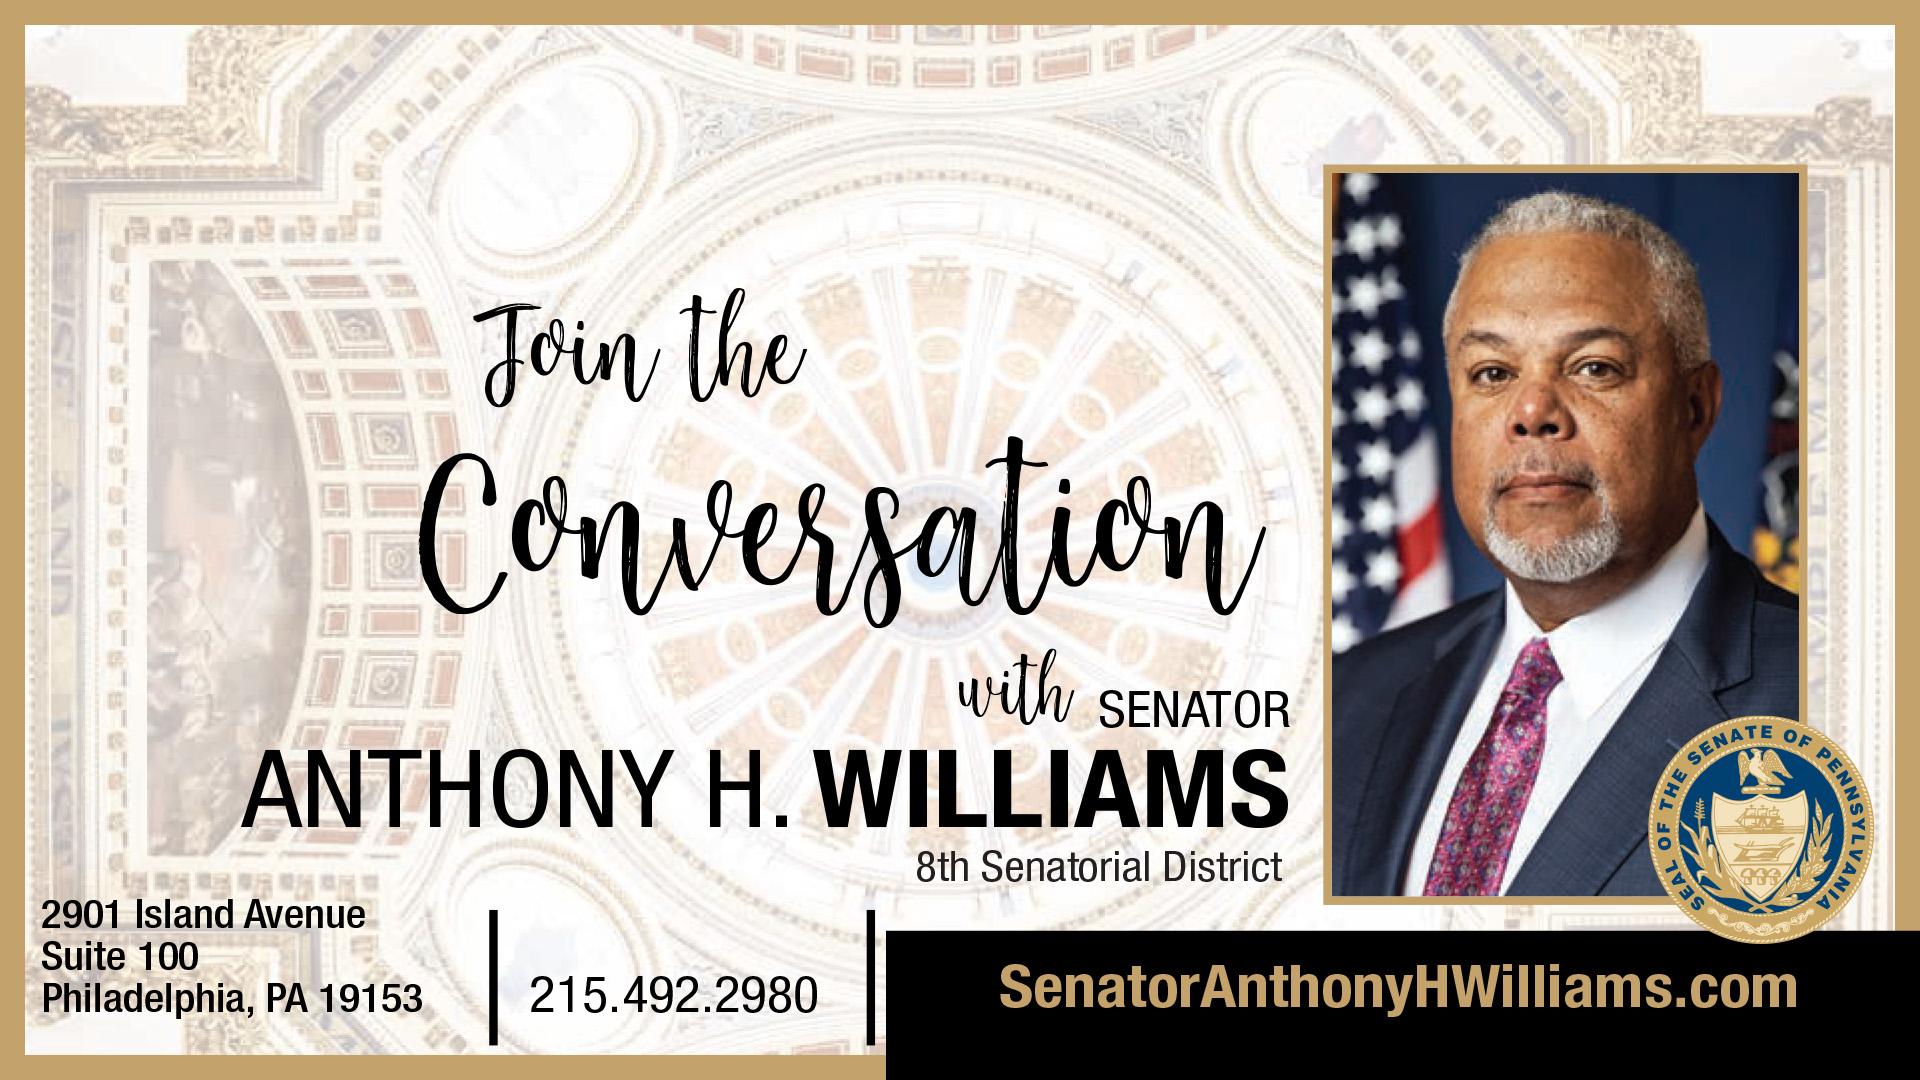 PA State Senator Anthony H. Williams